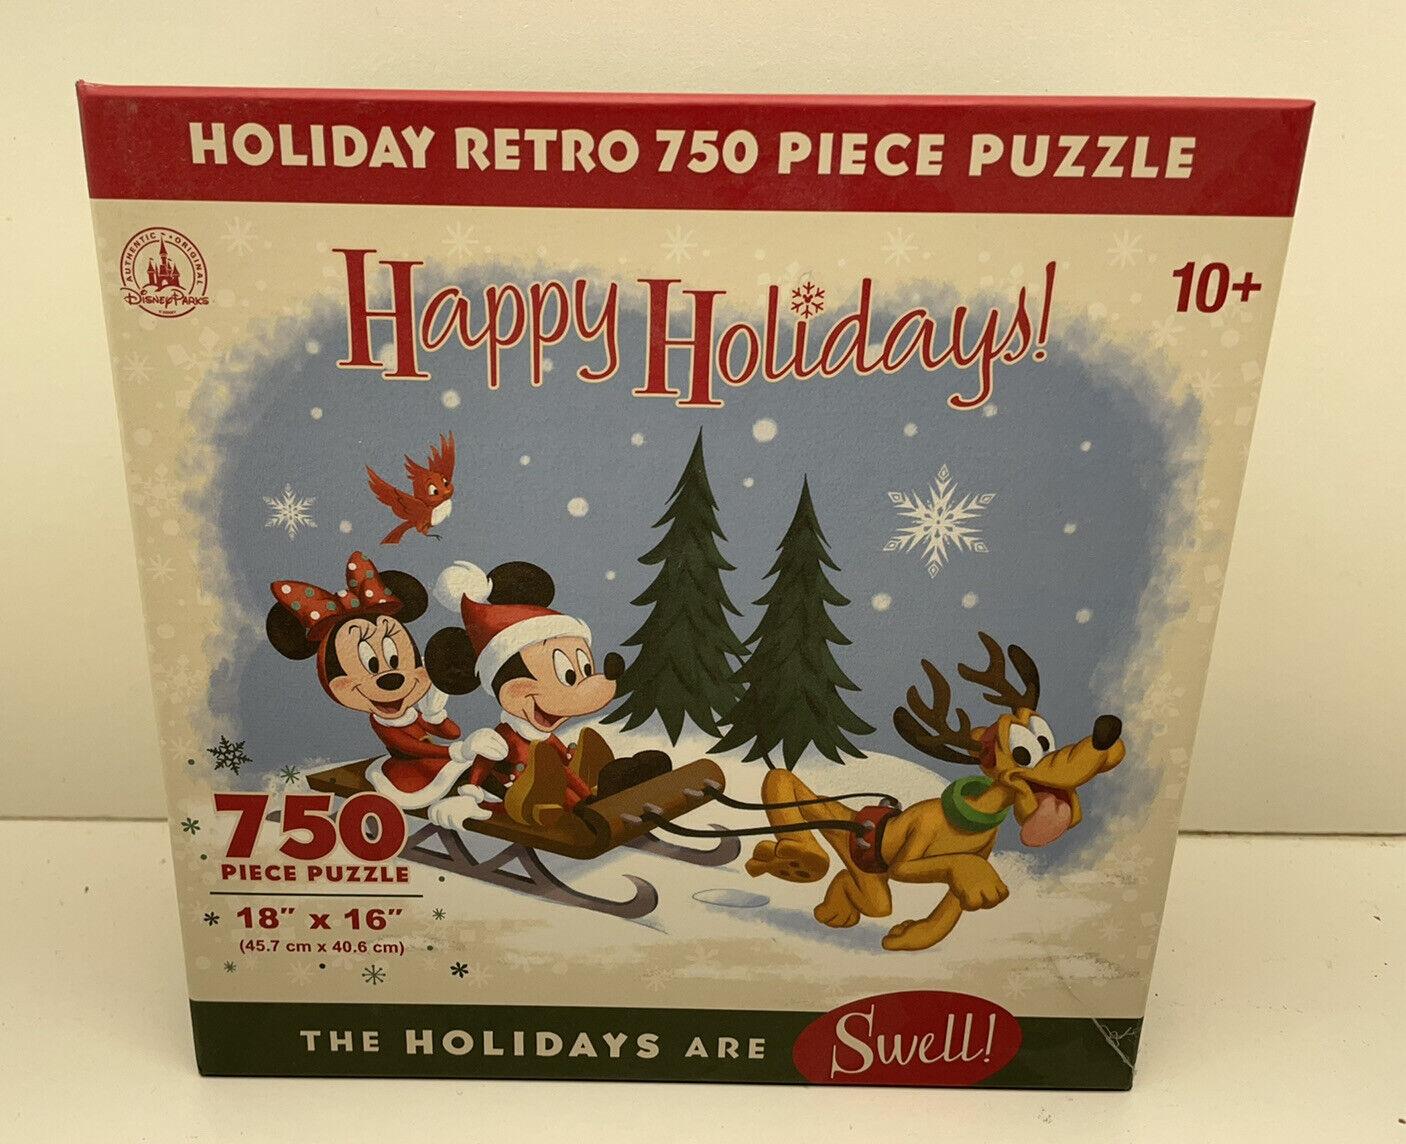 8-Bit Armageddon Retro Video Game Puzzle1000 Piece Jigsaw Puzzle